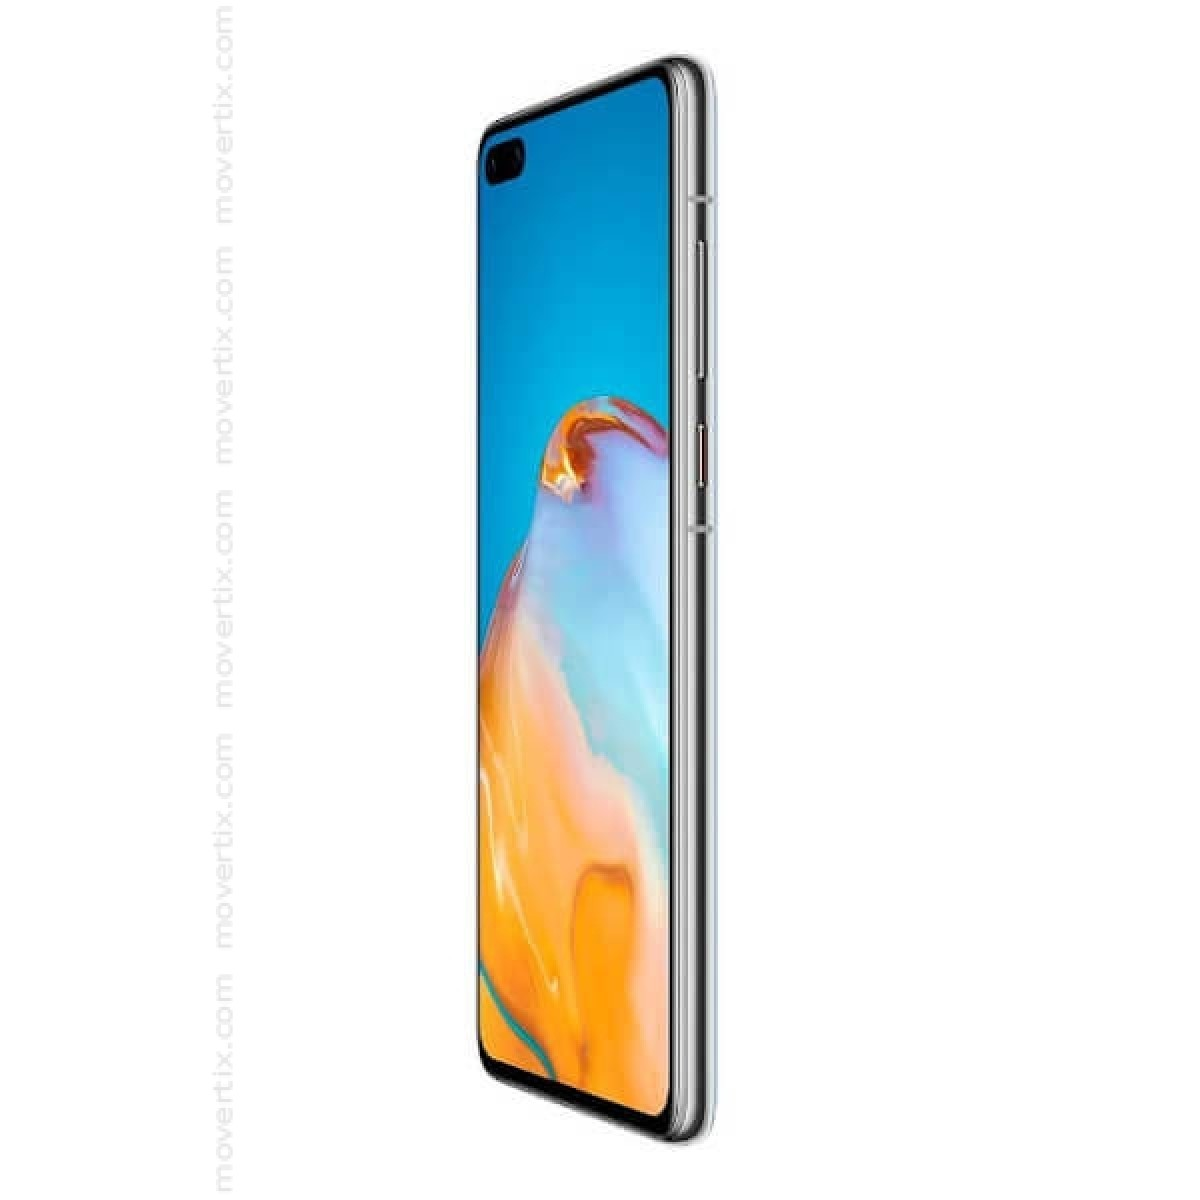 Huawei P40 Pro Dual Sim Ice White 256gb And 8gb Ram 6901443376933 Movertix Mobile Phones Shop